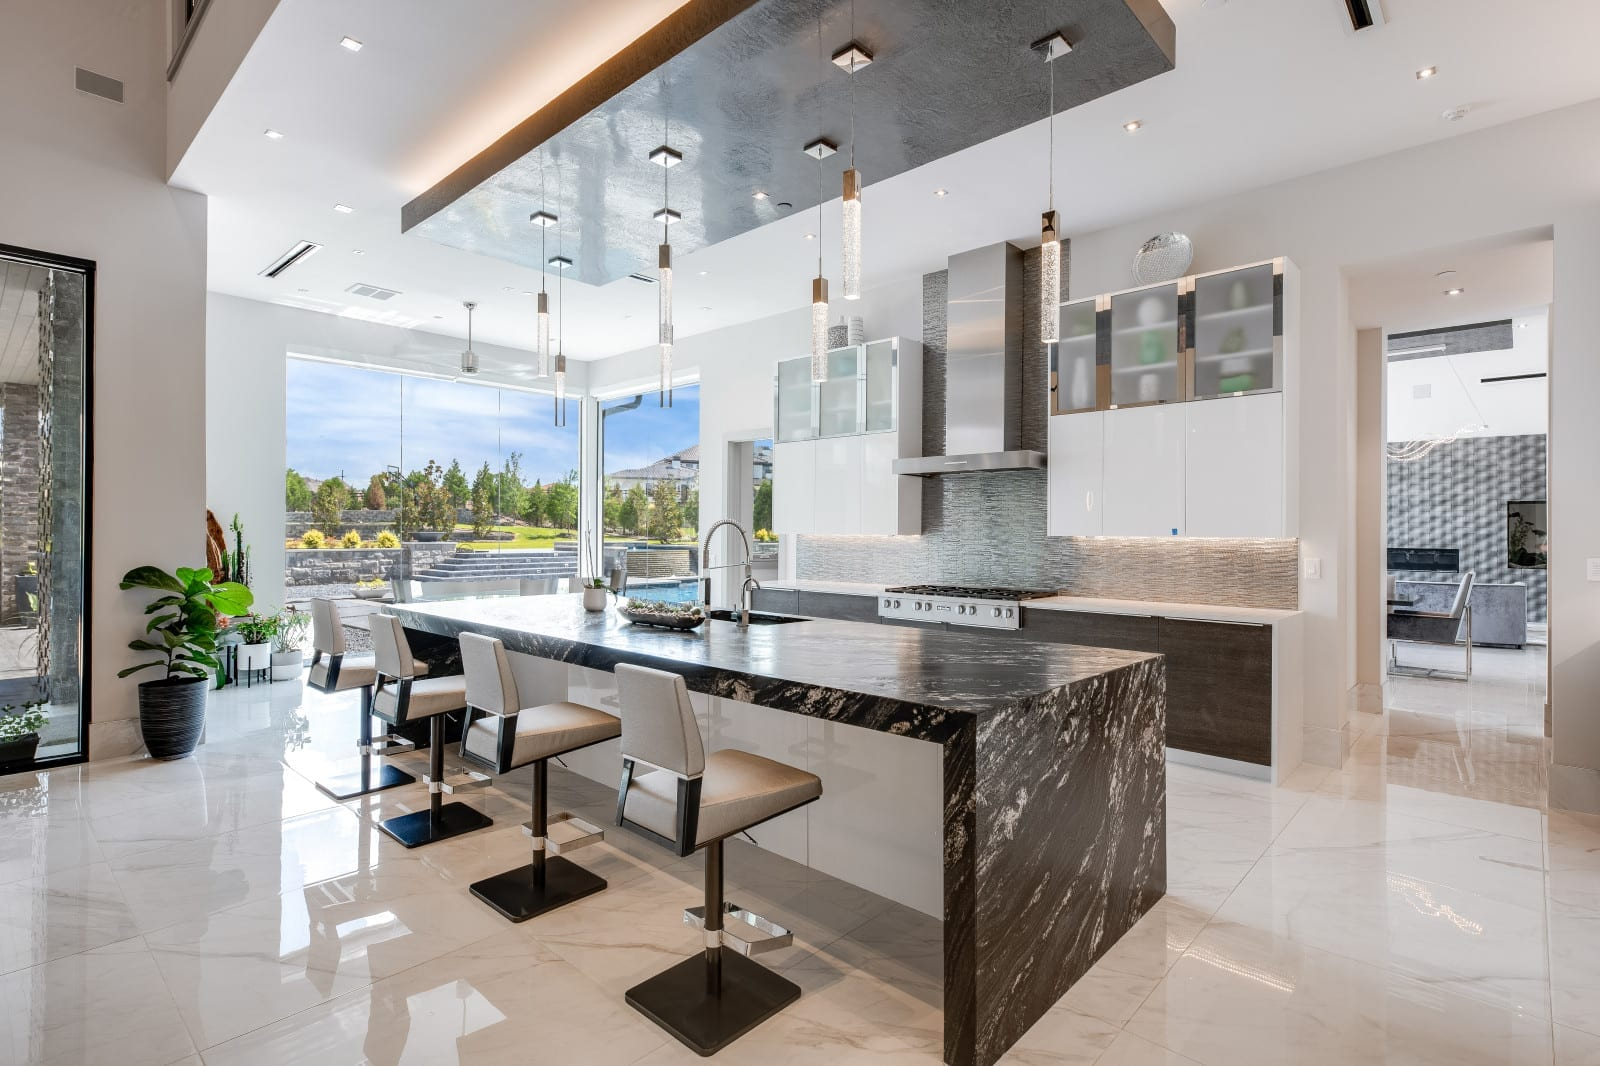 Custom Home Build and Interior Design # 25 - Millennial Design + Build, Home Builders in Dallas Texas, modern style homes, and custom home builders in DFW